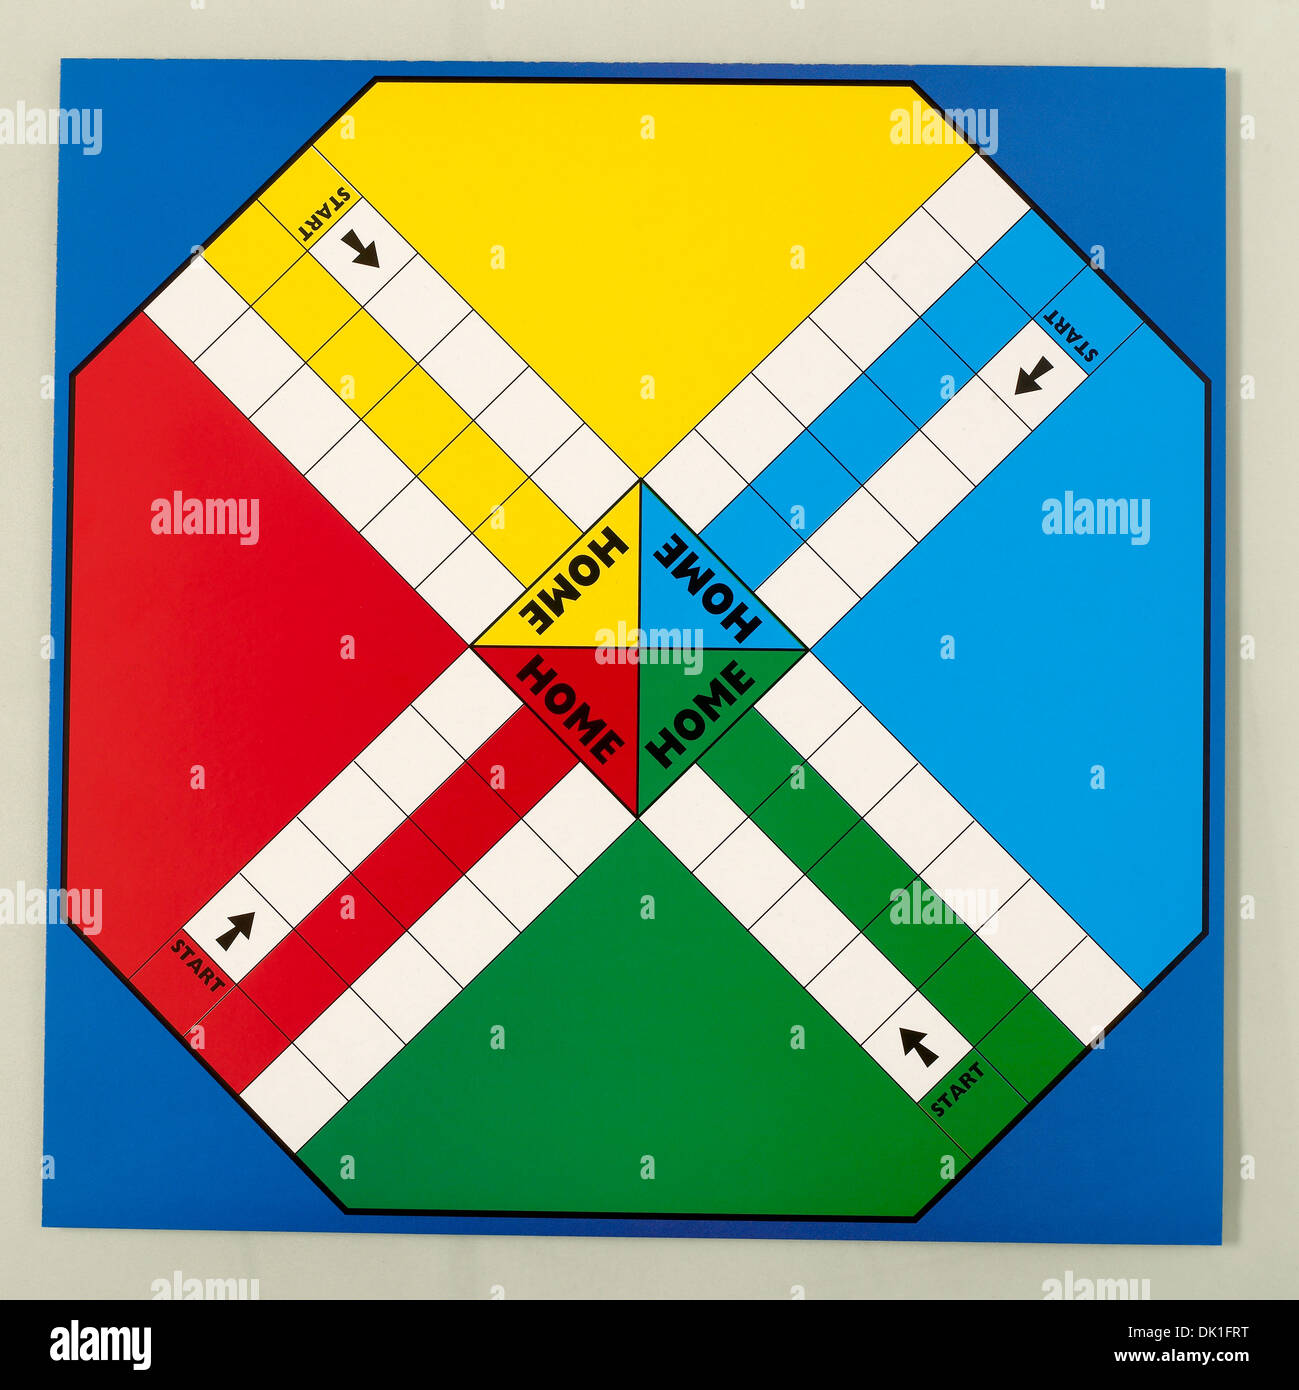 Game Board - Stock Image